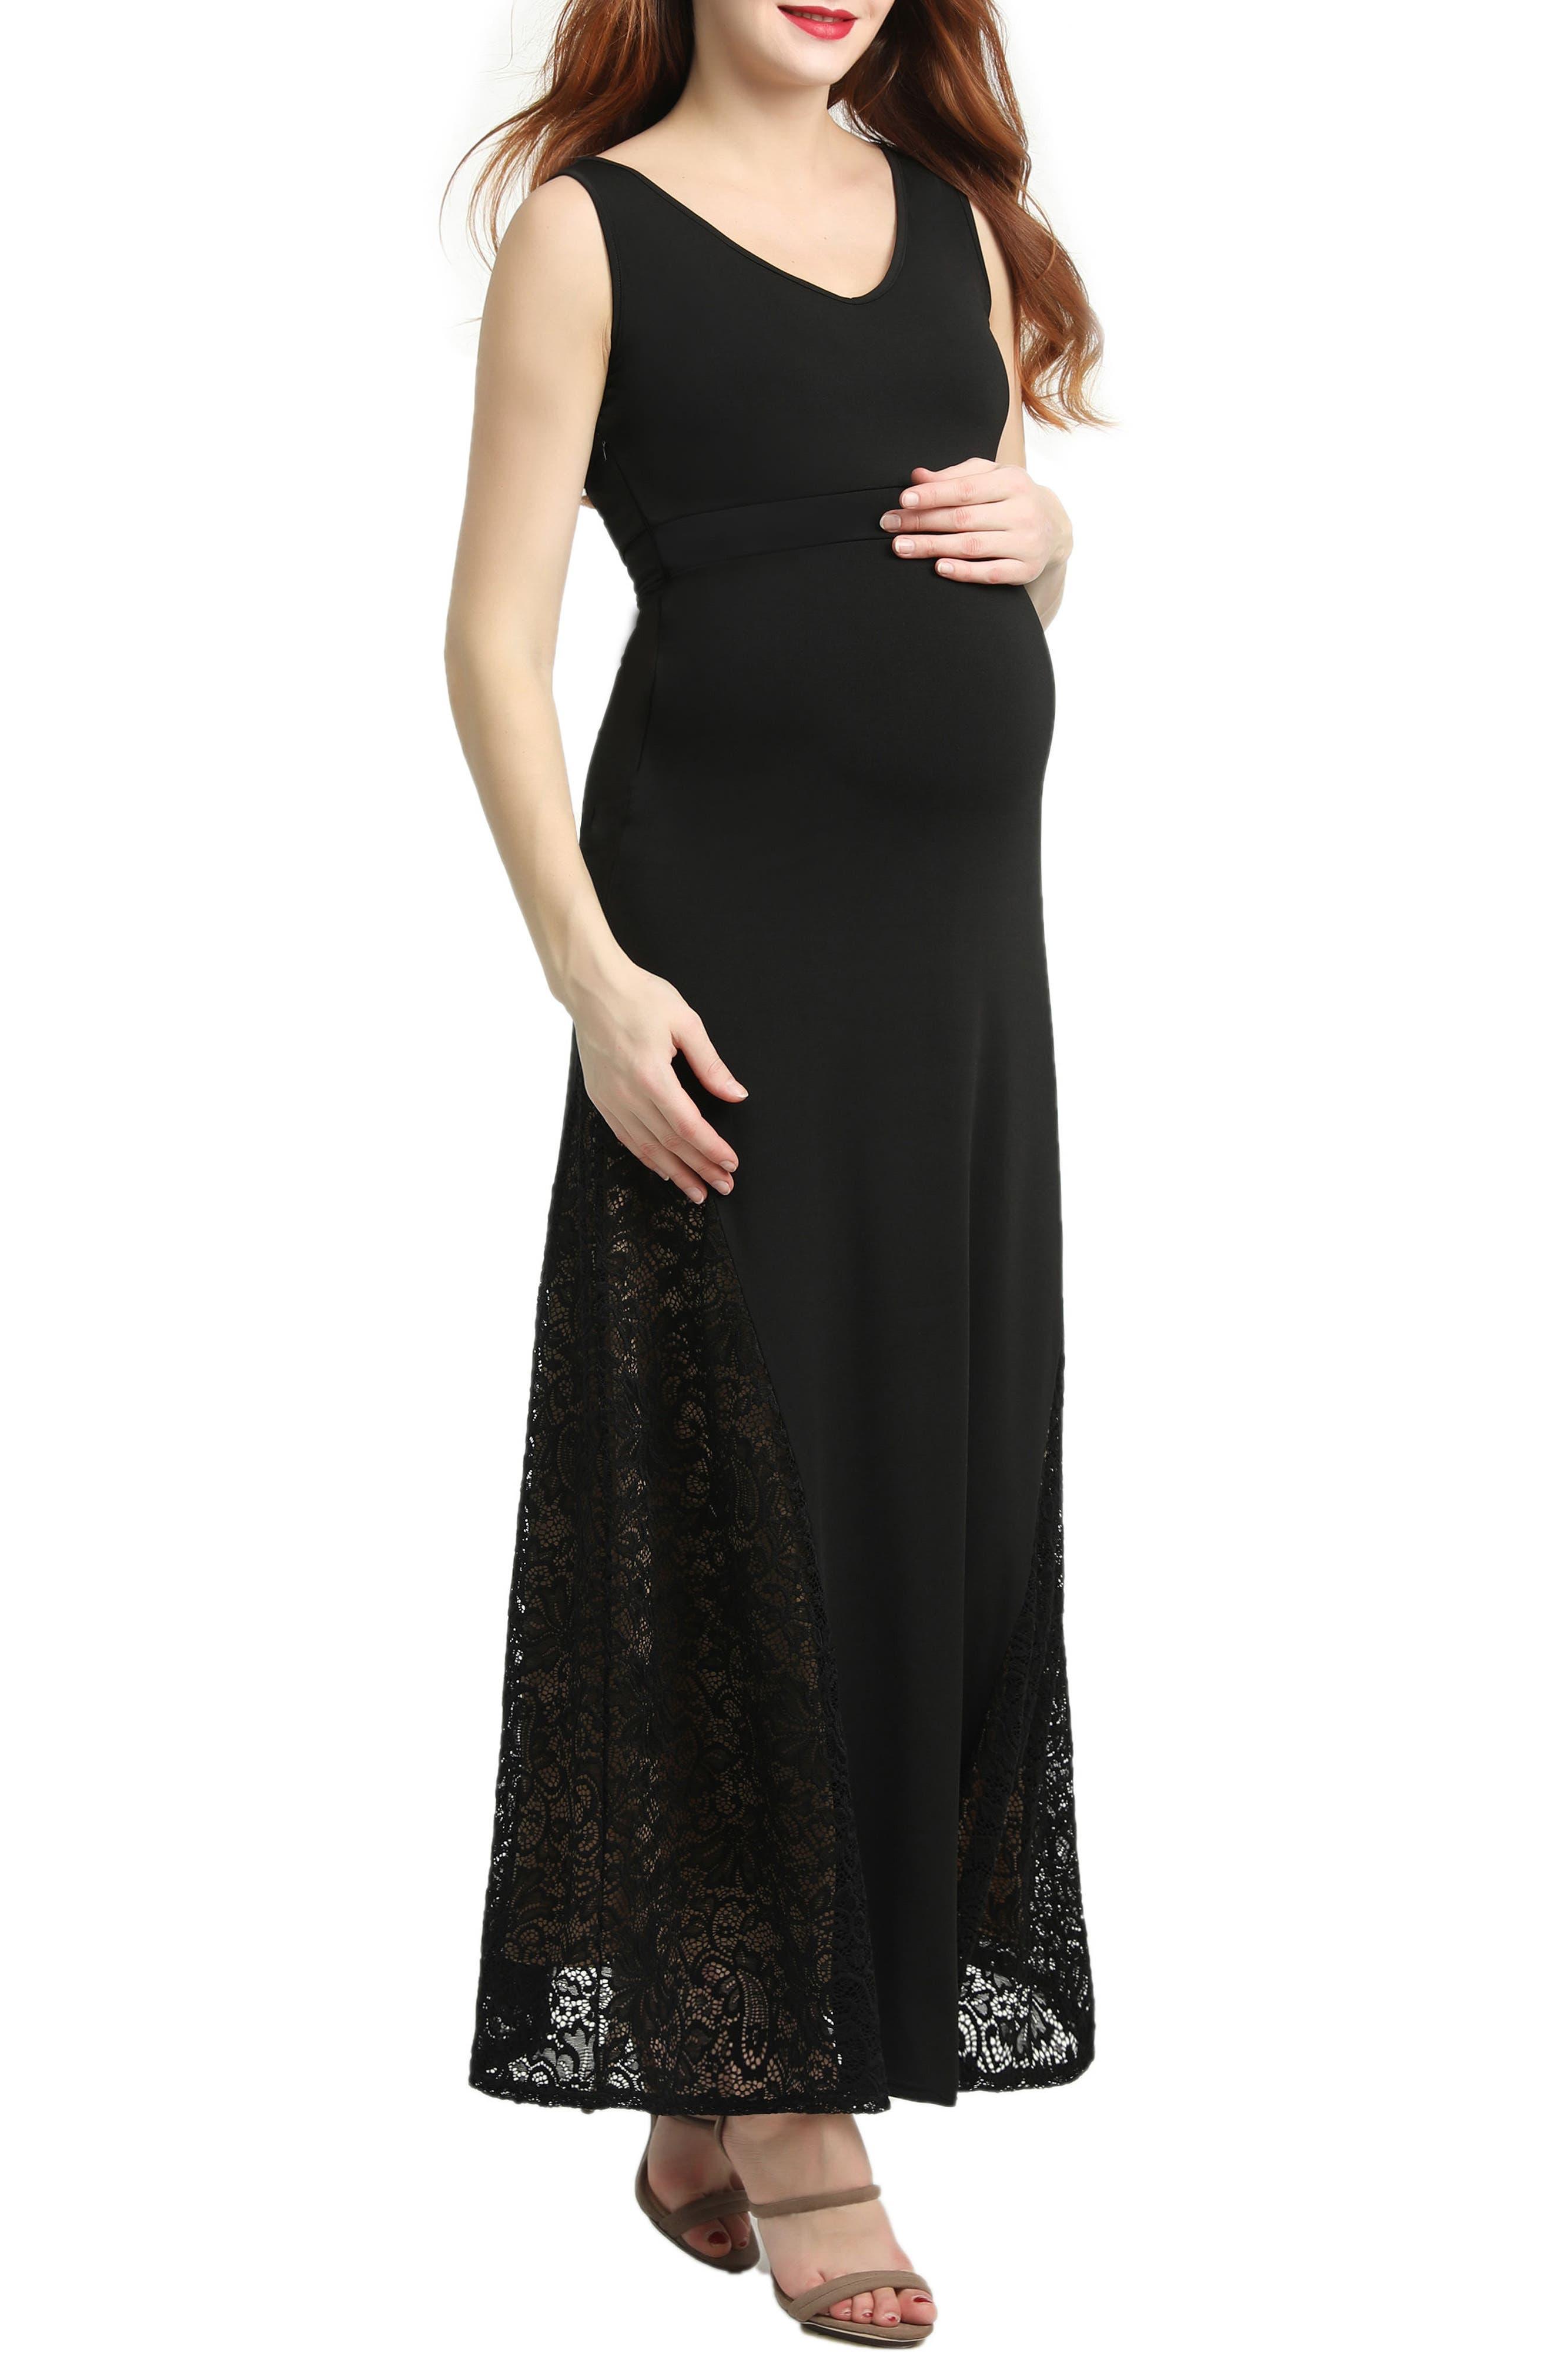 Elizabeth Lace Maternity Maxi Dress